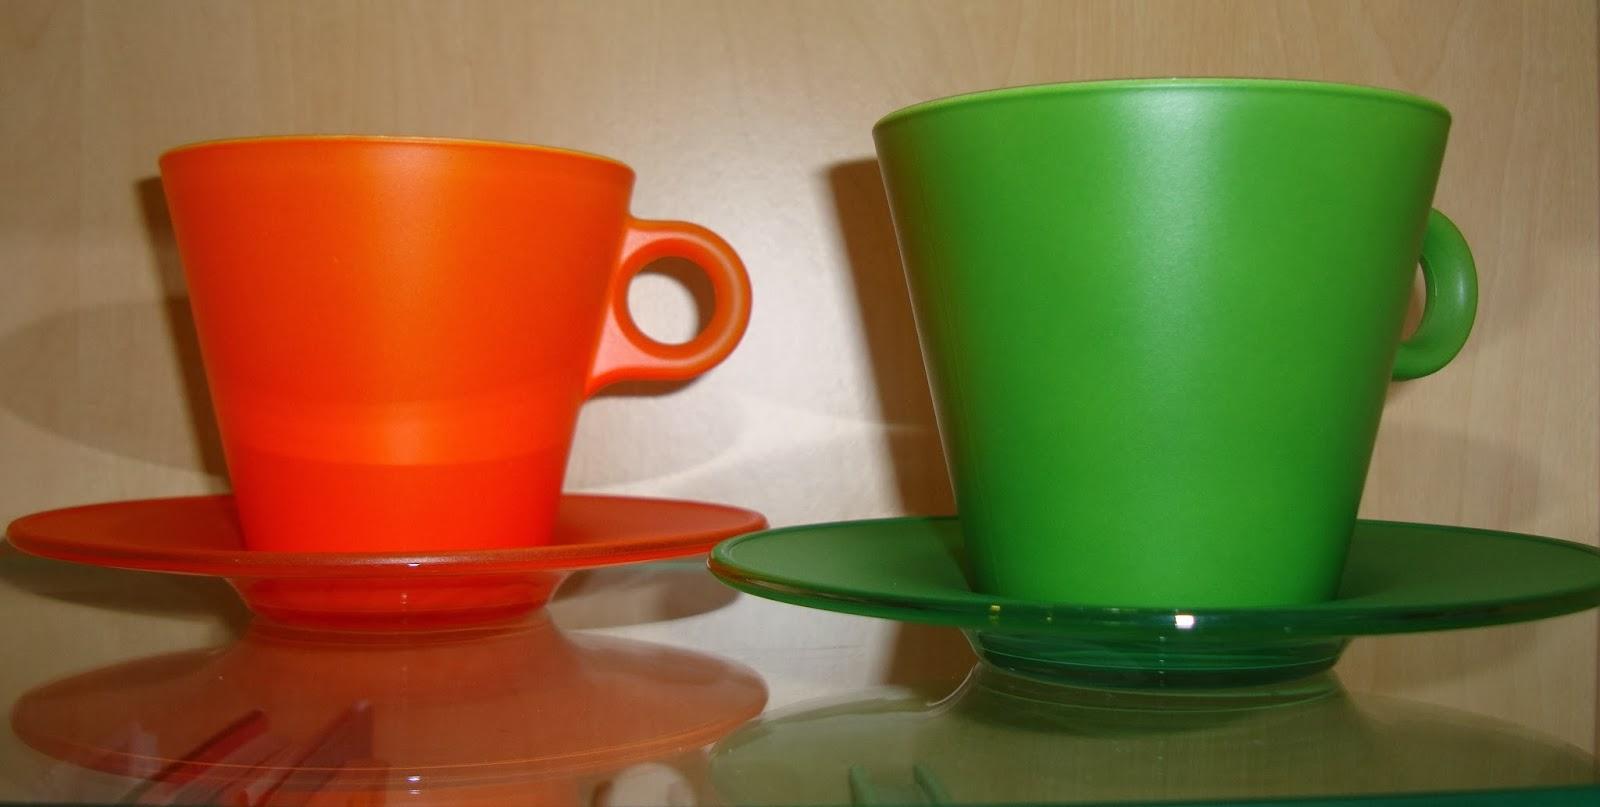 Ooh magico cappuccino cups, Leonardo